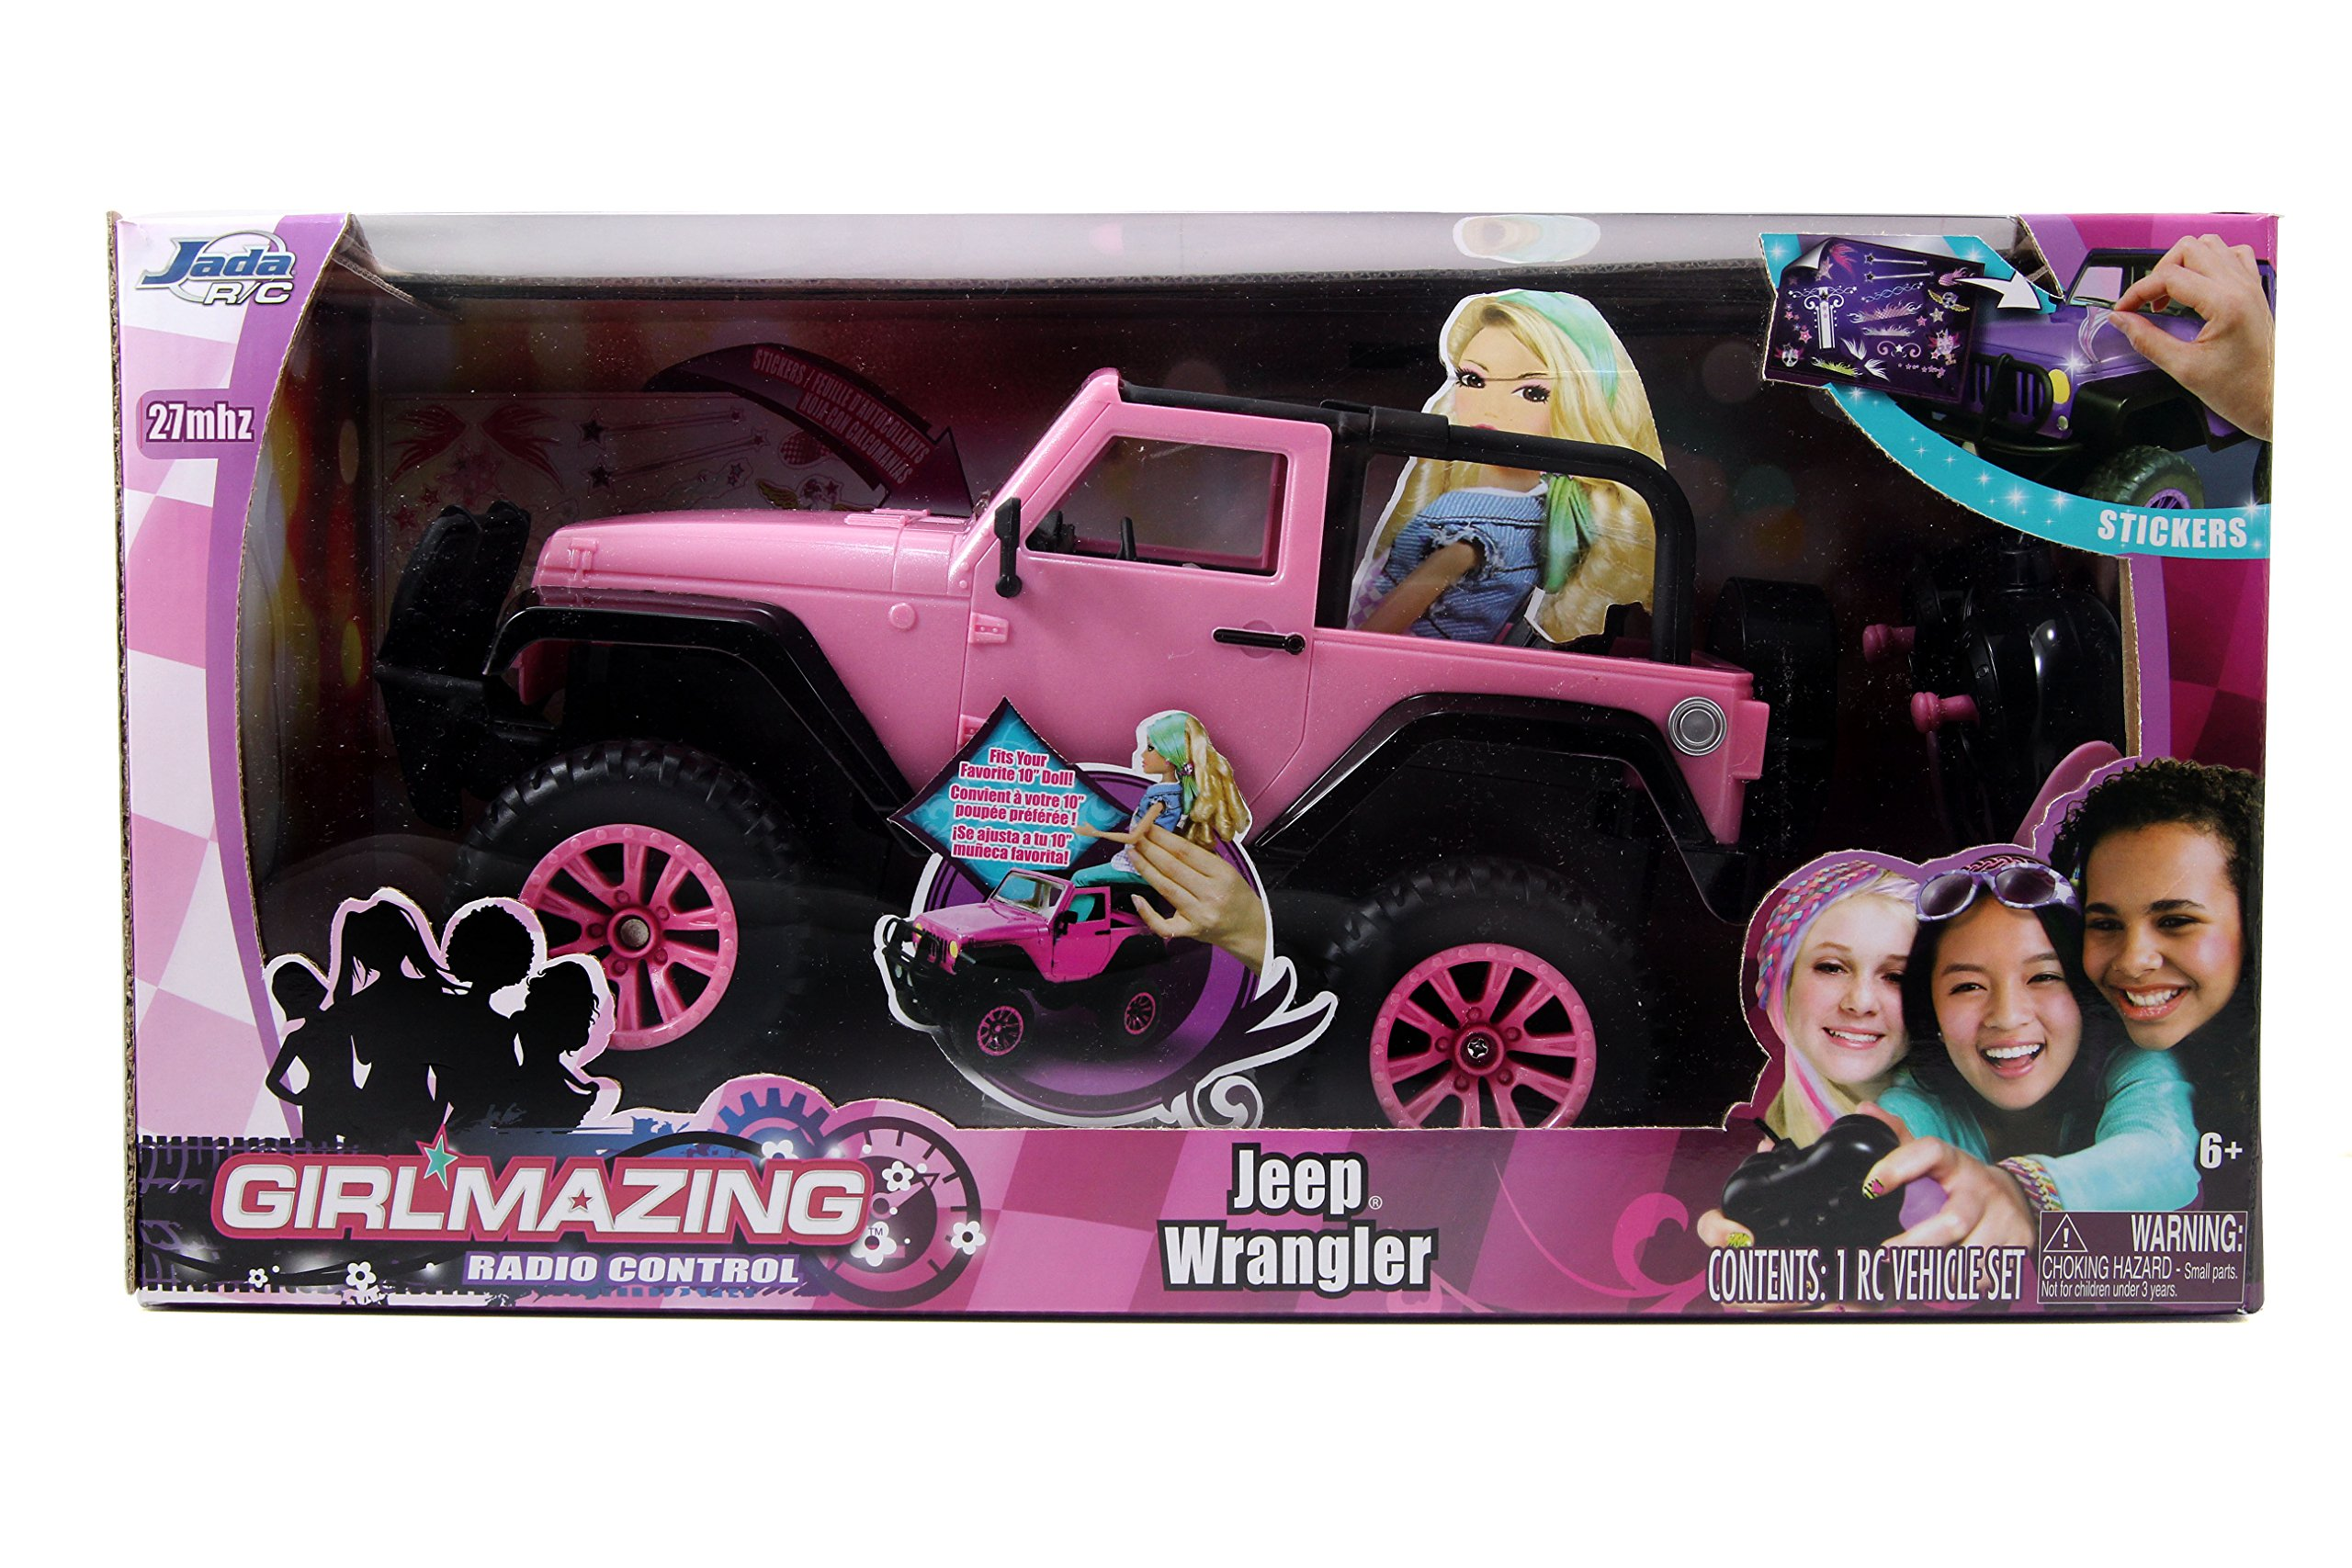 Jada Toys Girlmazing Big Foot Jeep R/C Vehicle (1:16 Scale) Pink 8